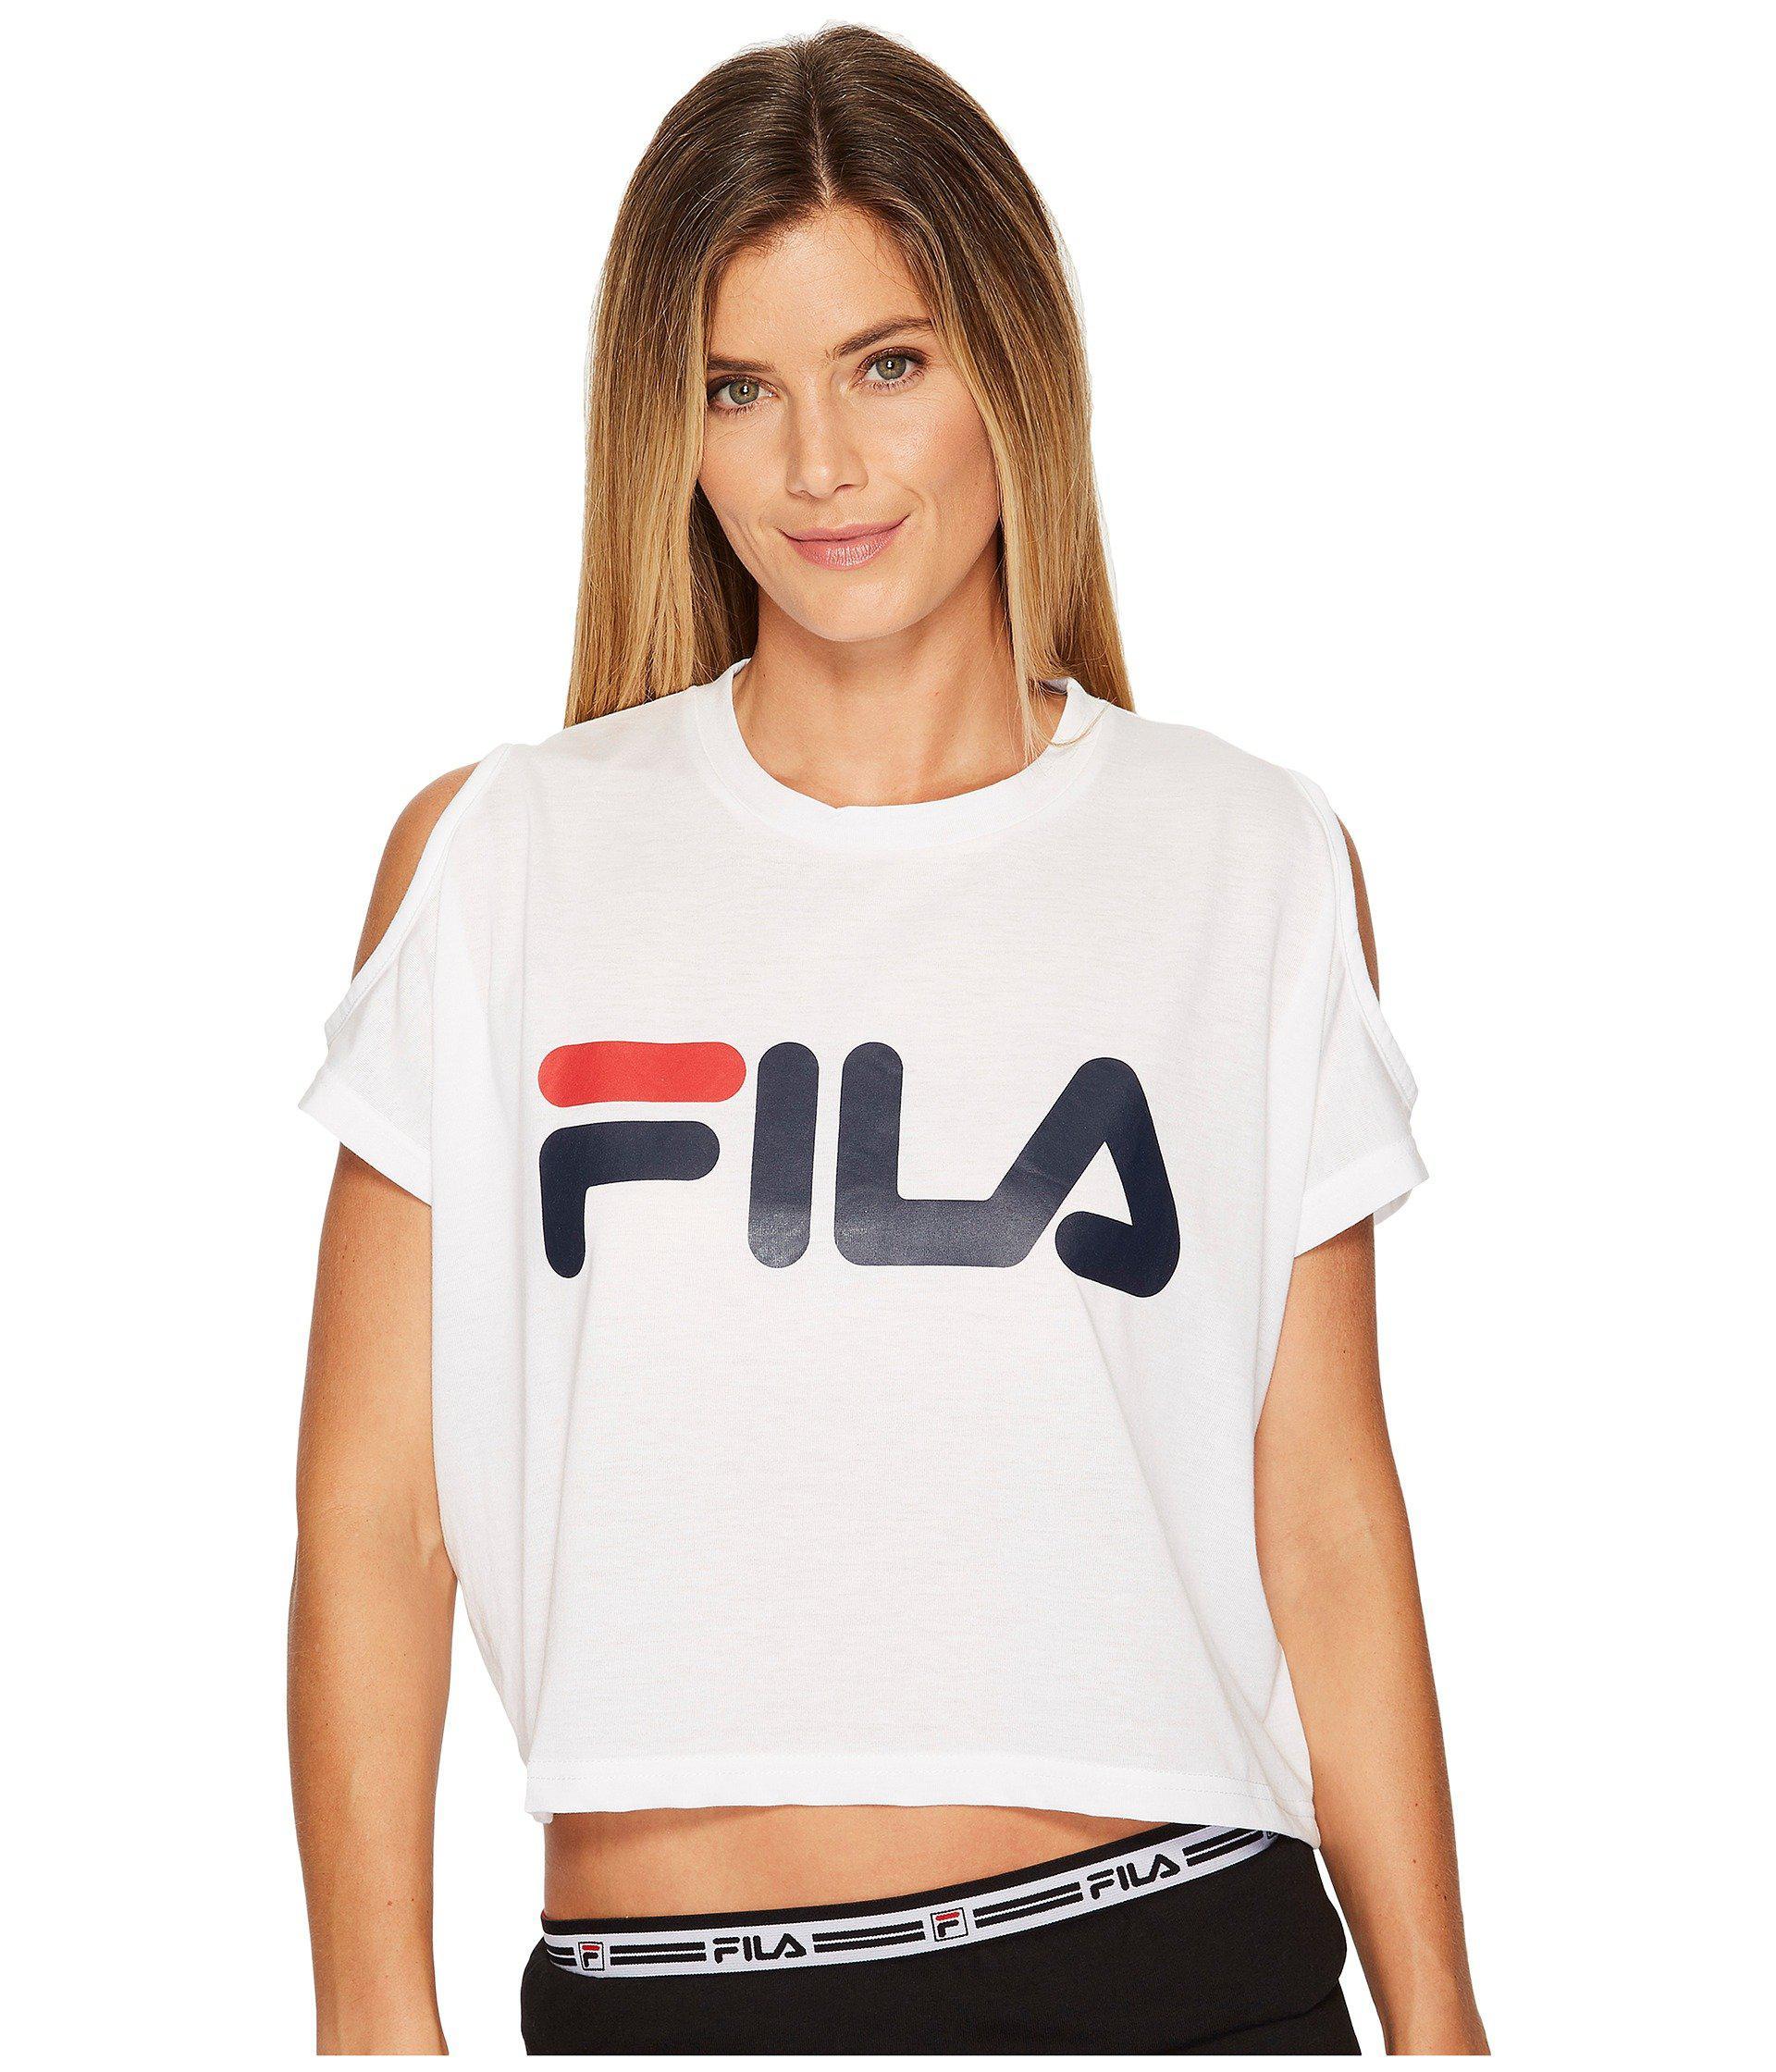 7226ea3f76fa2c Lyst - Fila Nikki Crop Cold Shoulder Top in White